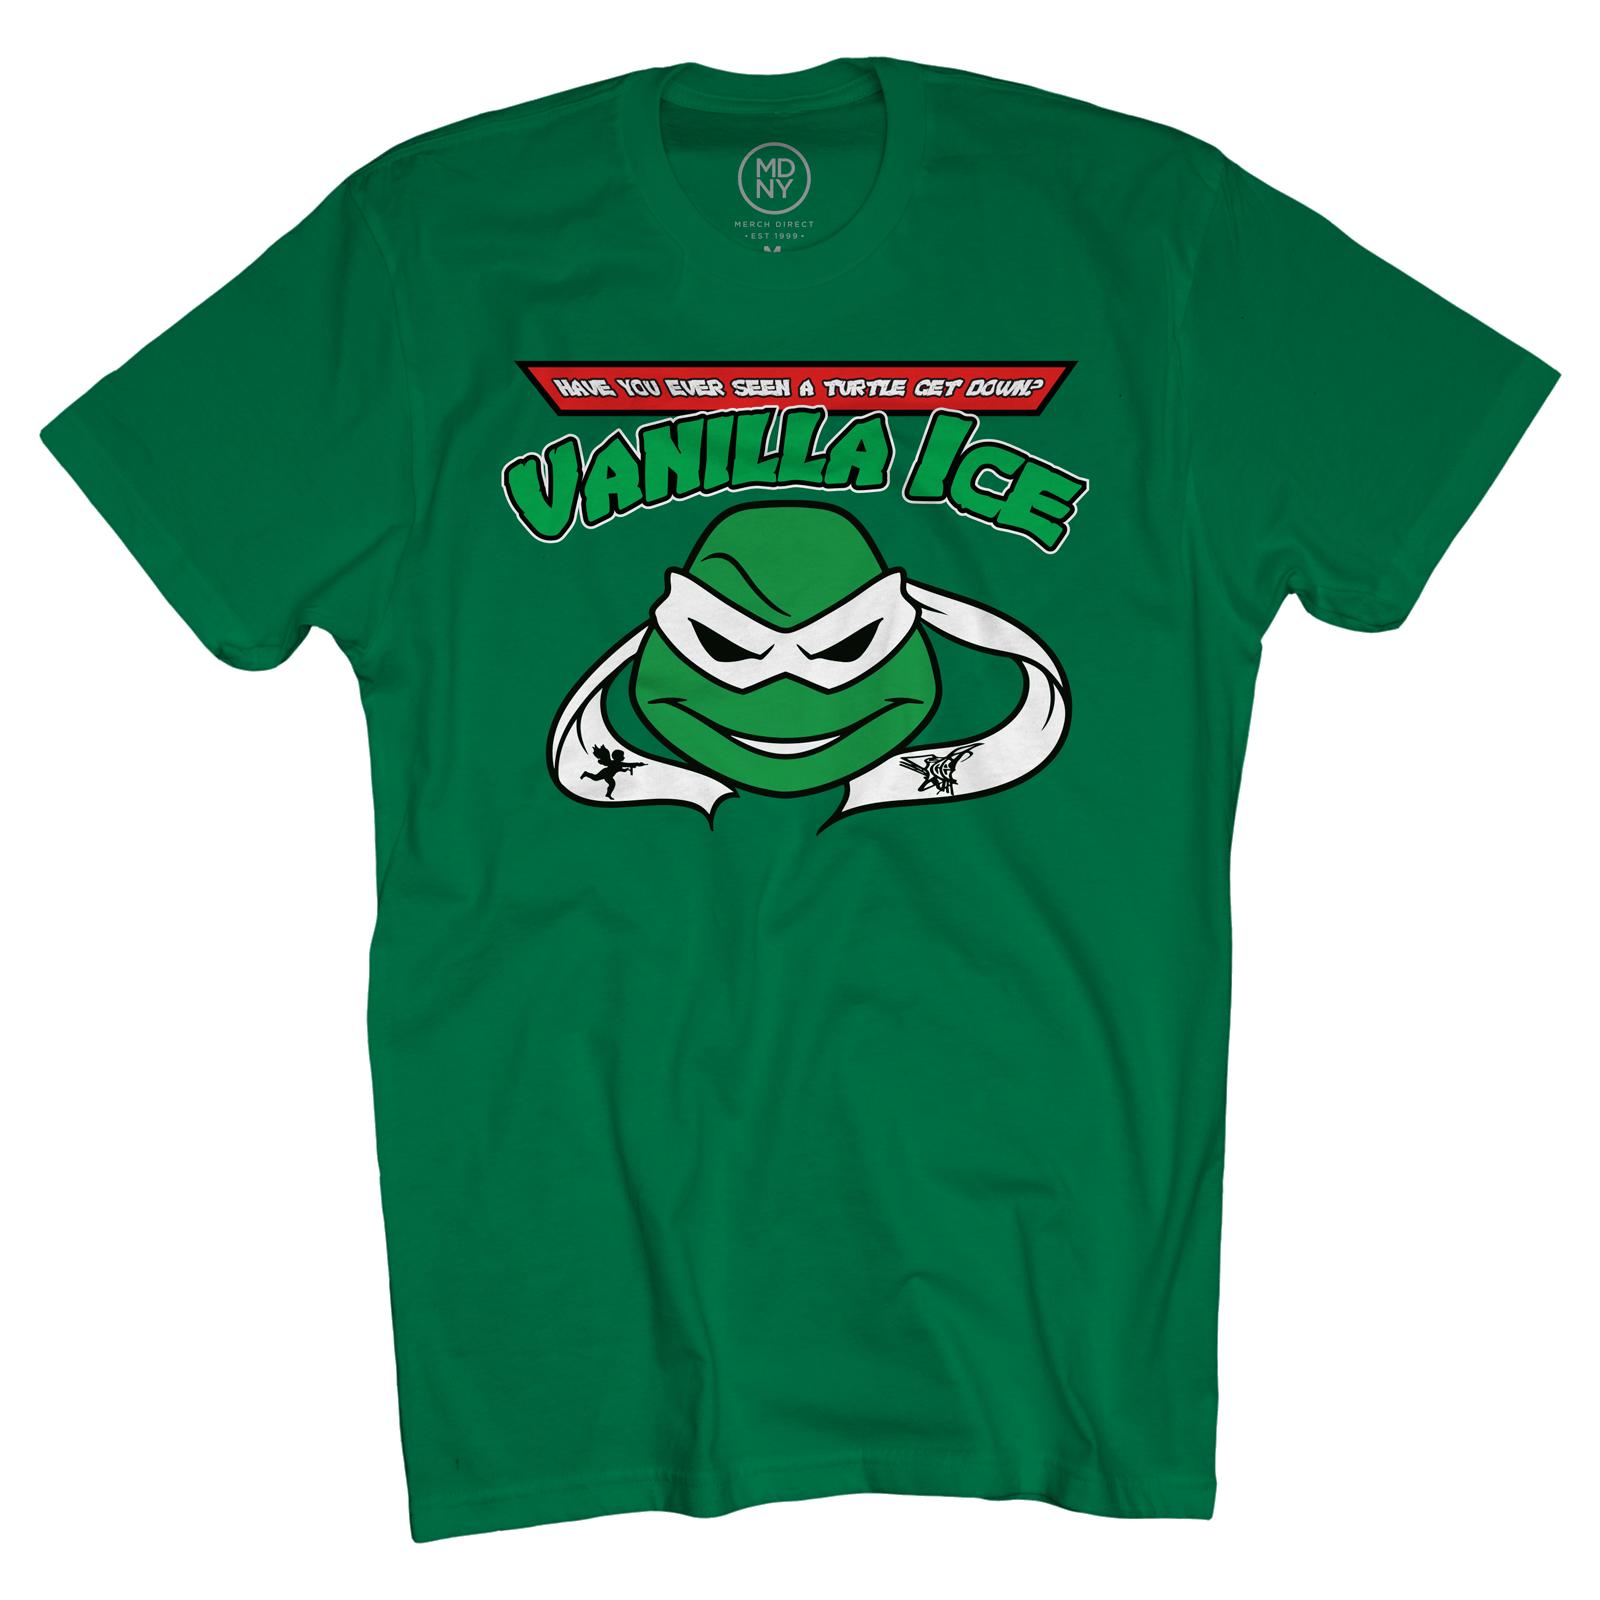 Go Ninja, Go! T-Shirt